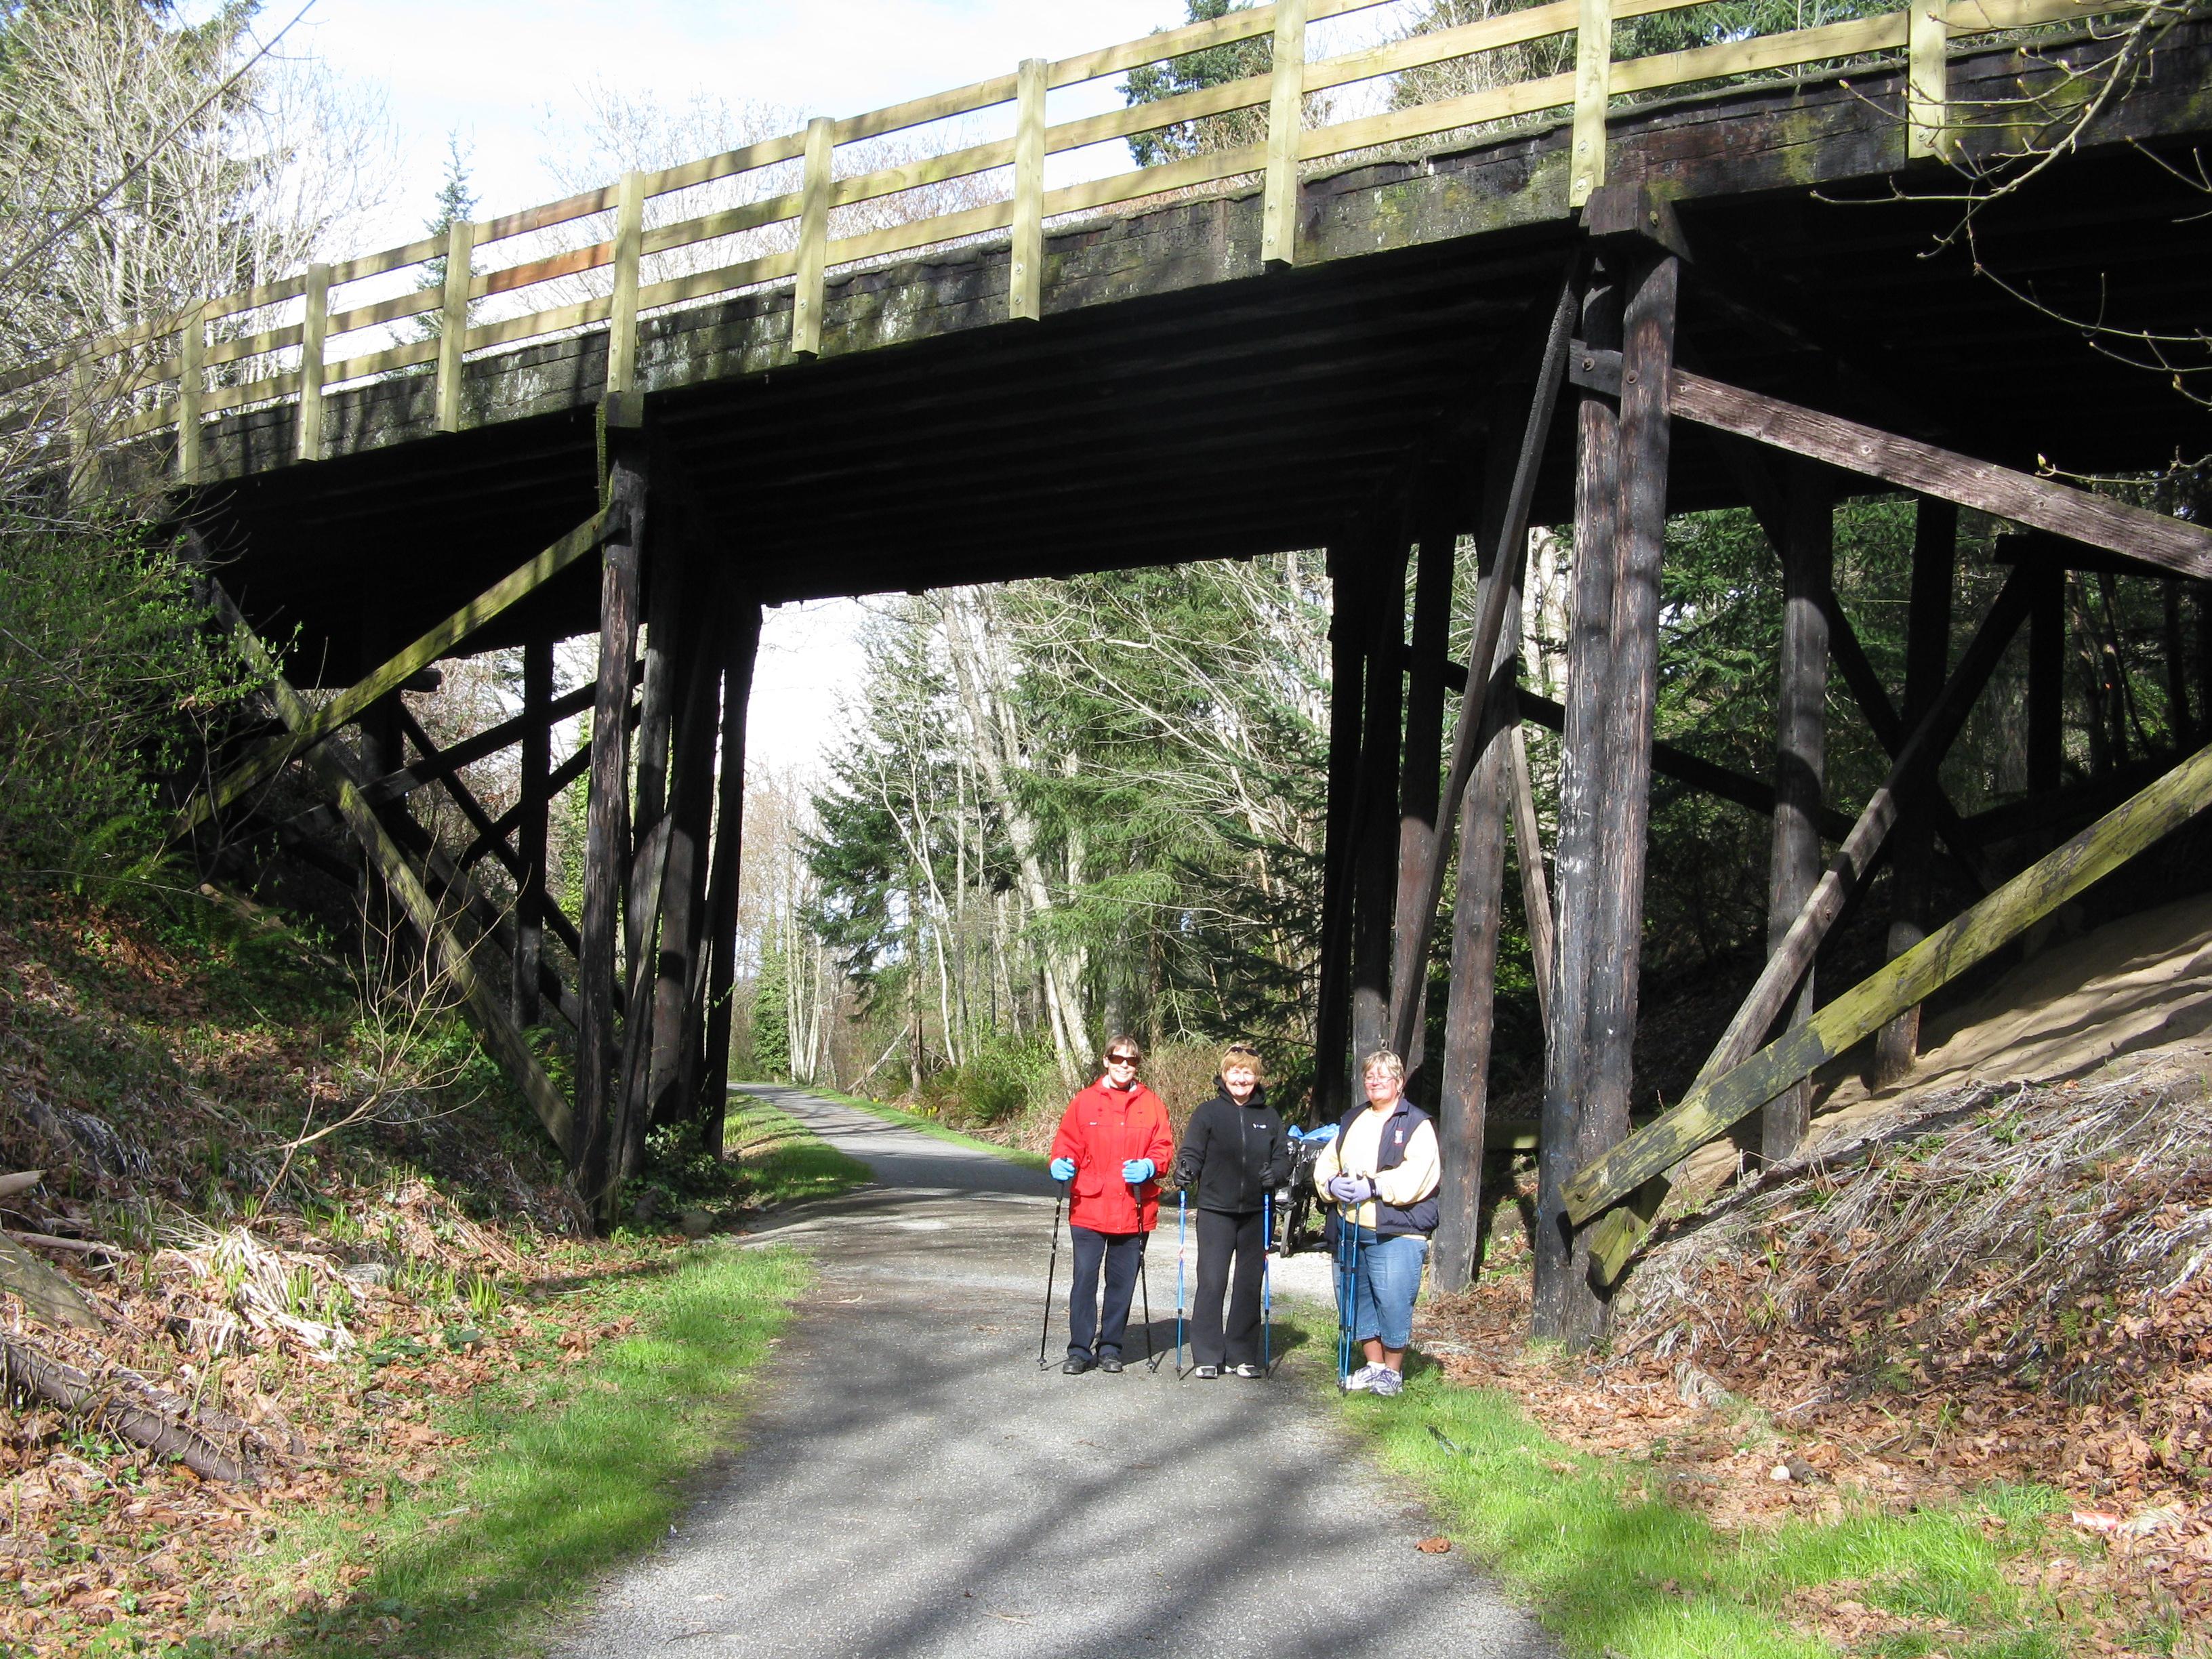 Bridge over Goose near Royal Roads